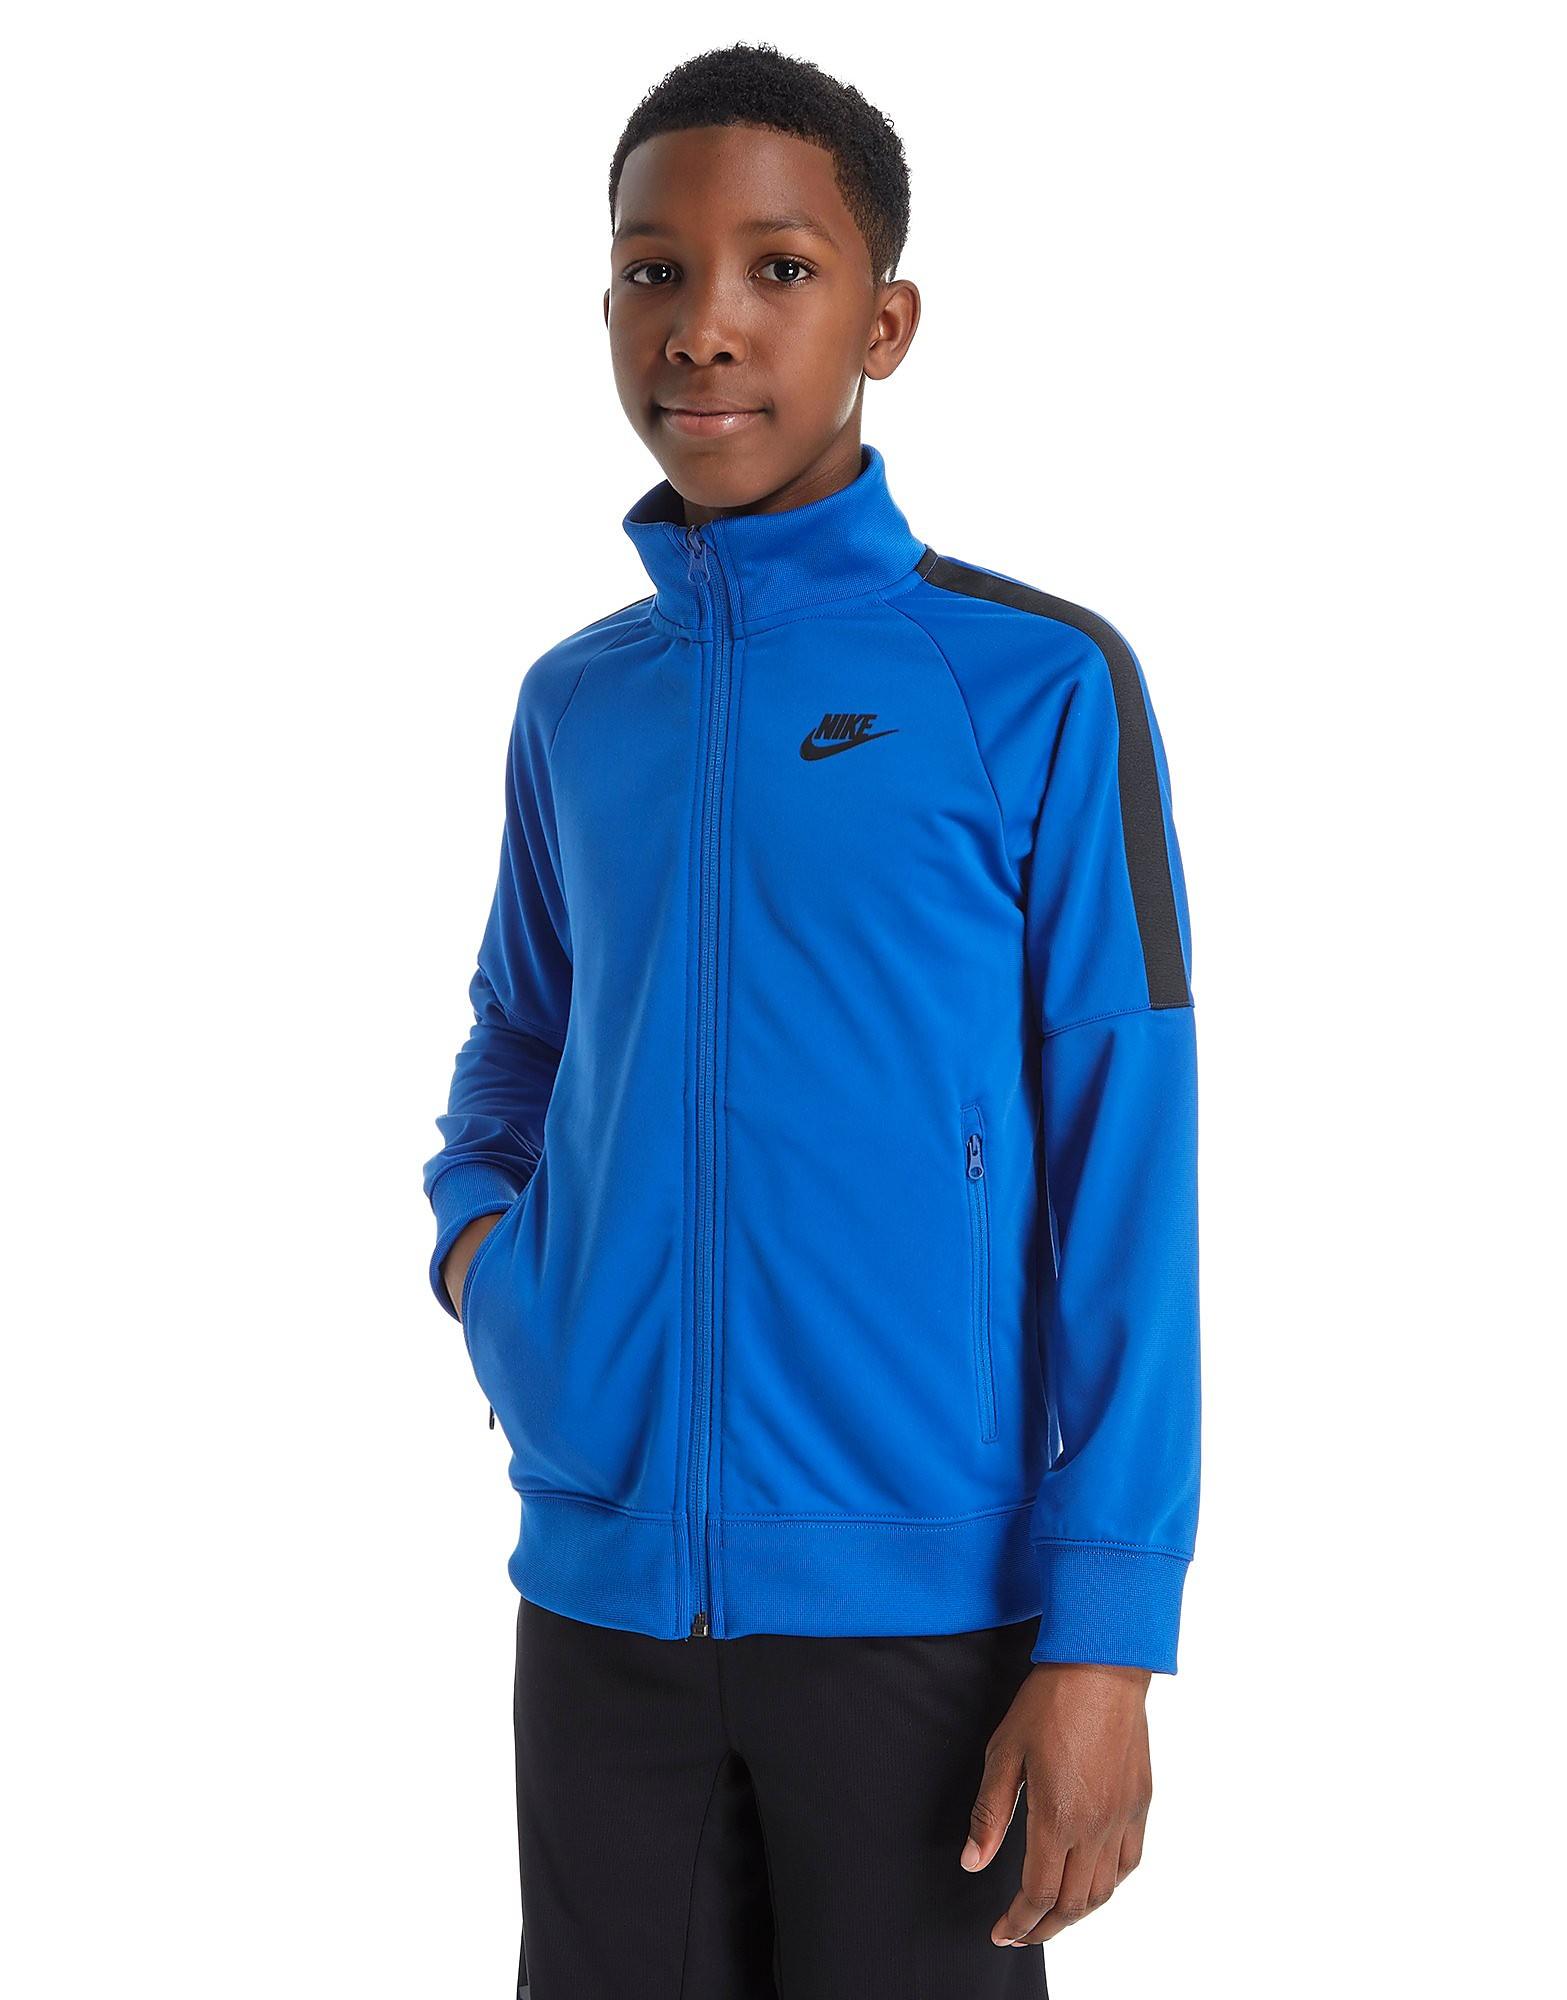 Nike Tribute Track Top Junior